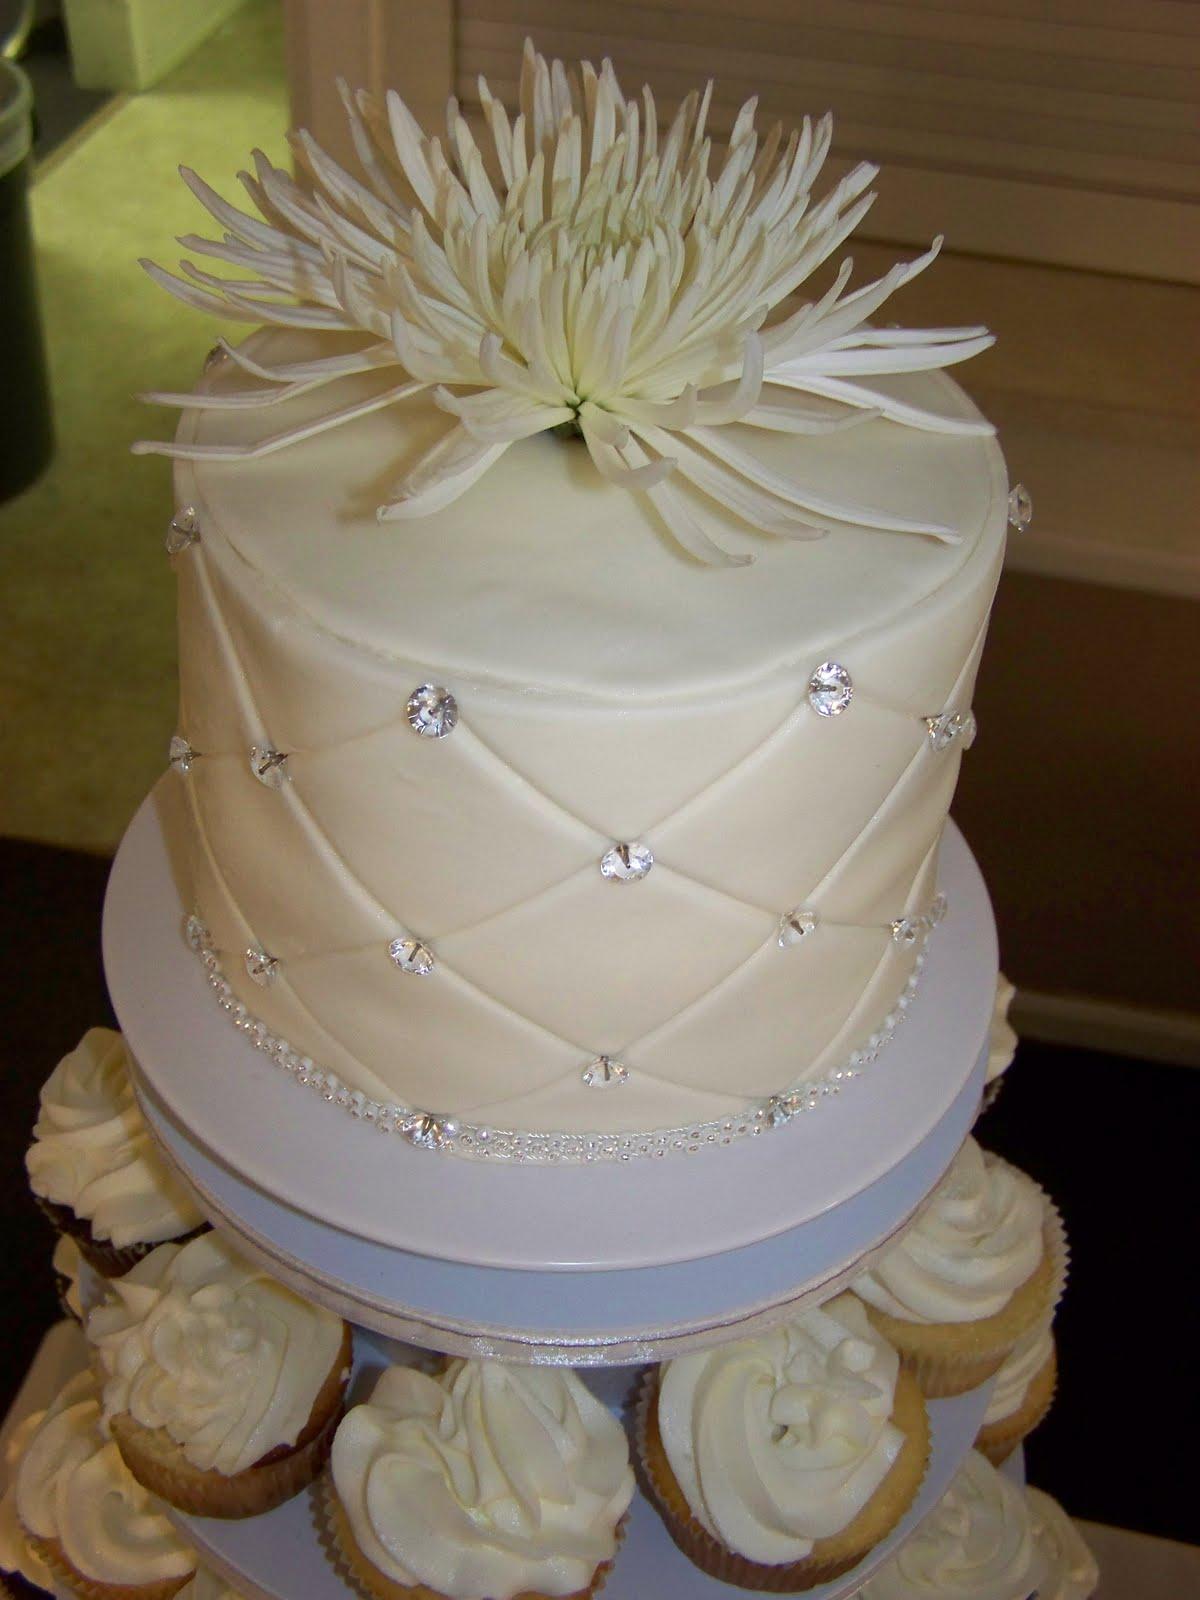 Diamond Anniversary Cake Images : Cake-A-Licious: Diamond Anniversary Cake & Cupcake Tower